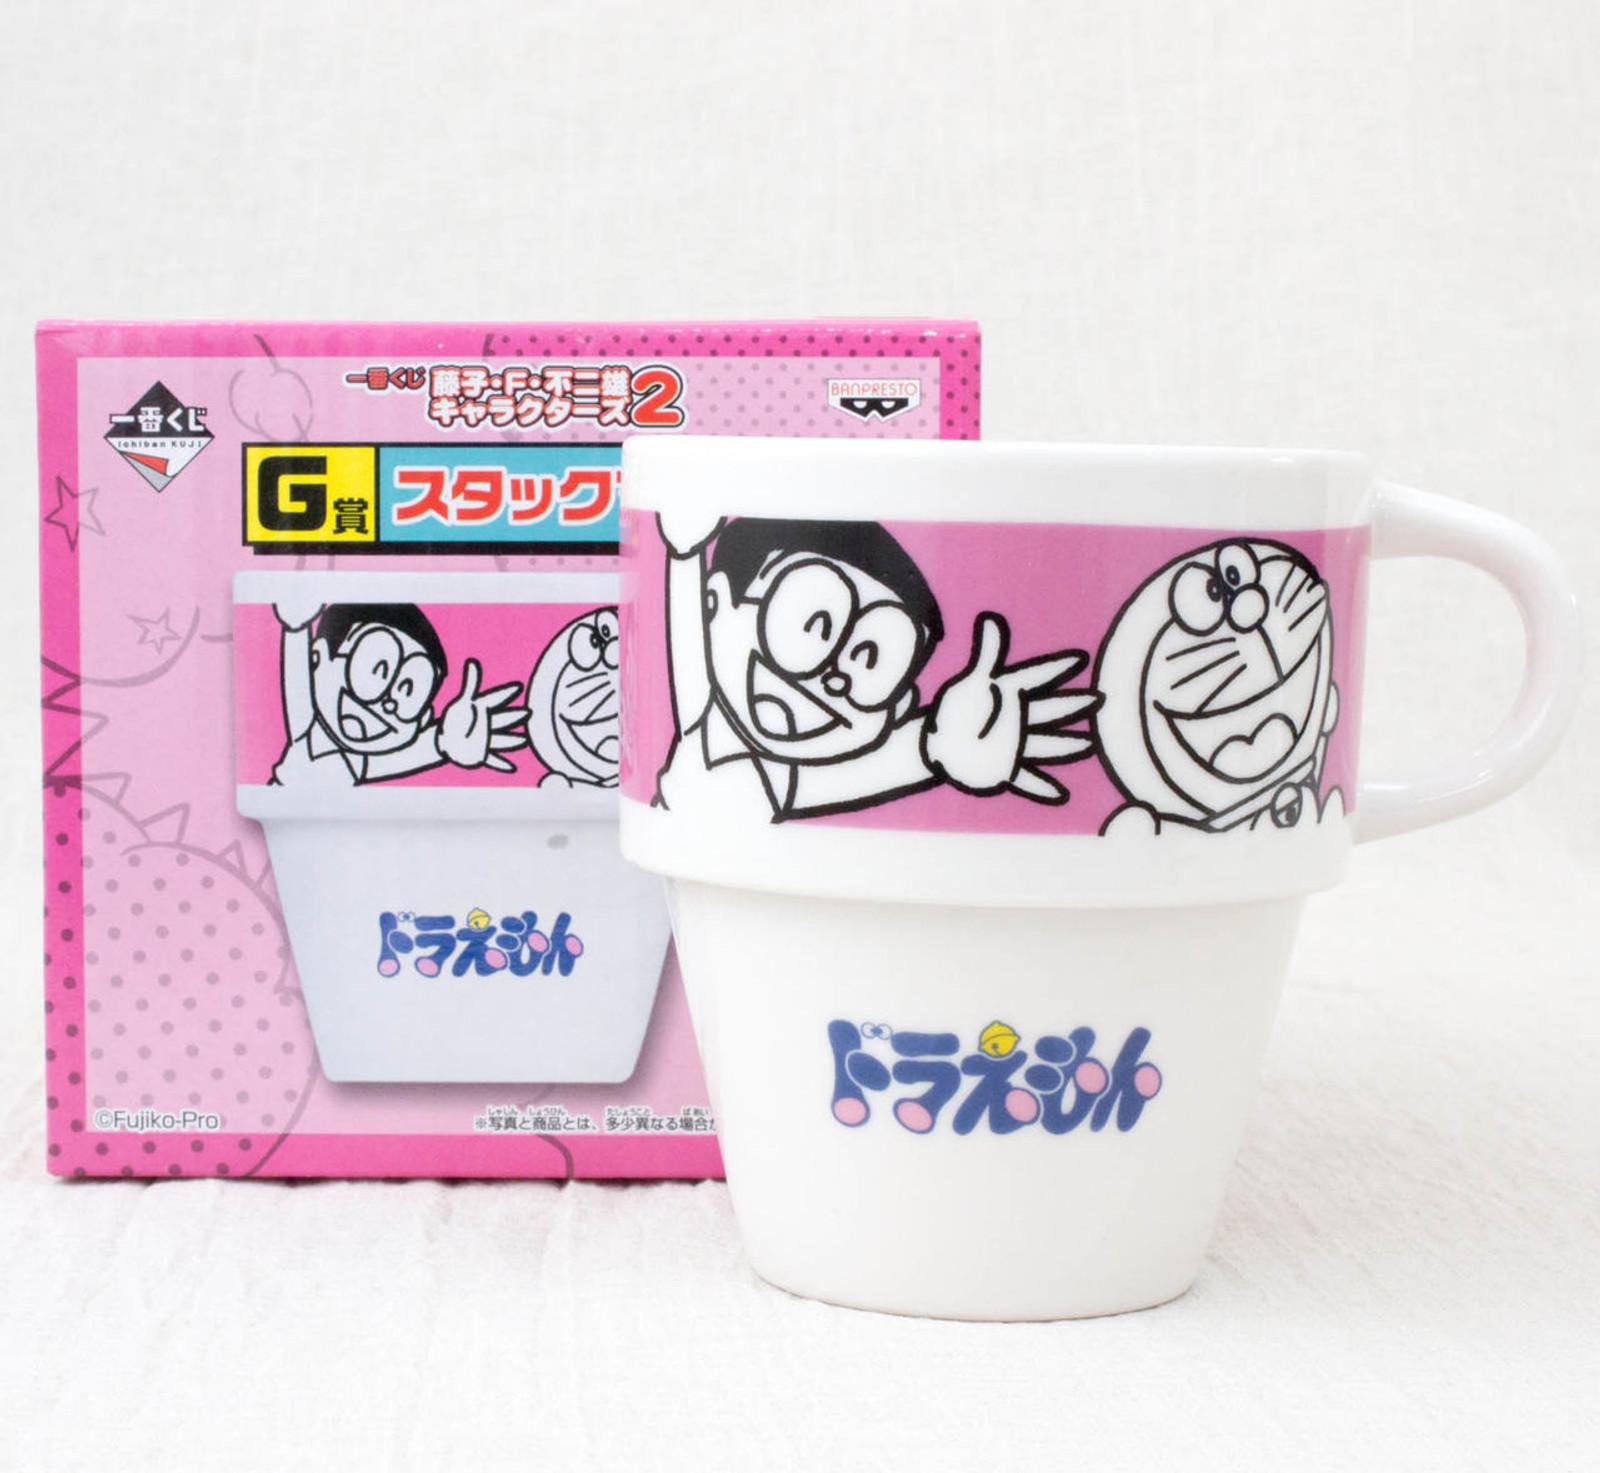 Fujiko F Fujio Characters Stacking Mug Cup Doraemon Nobita JAPAN ANIME MANGA